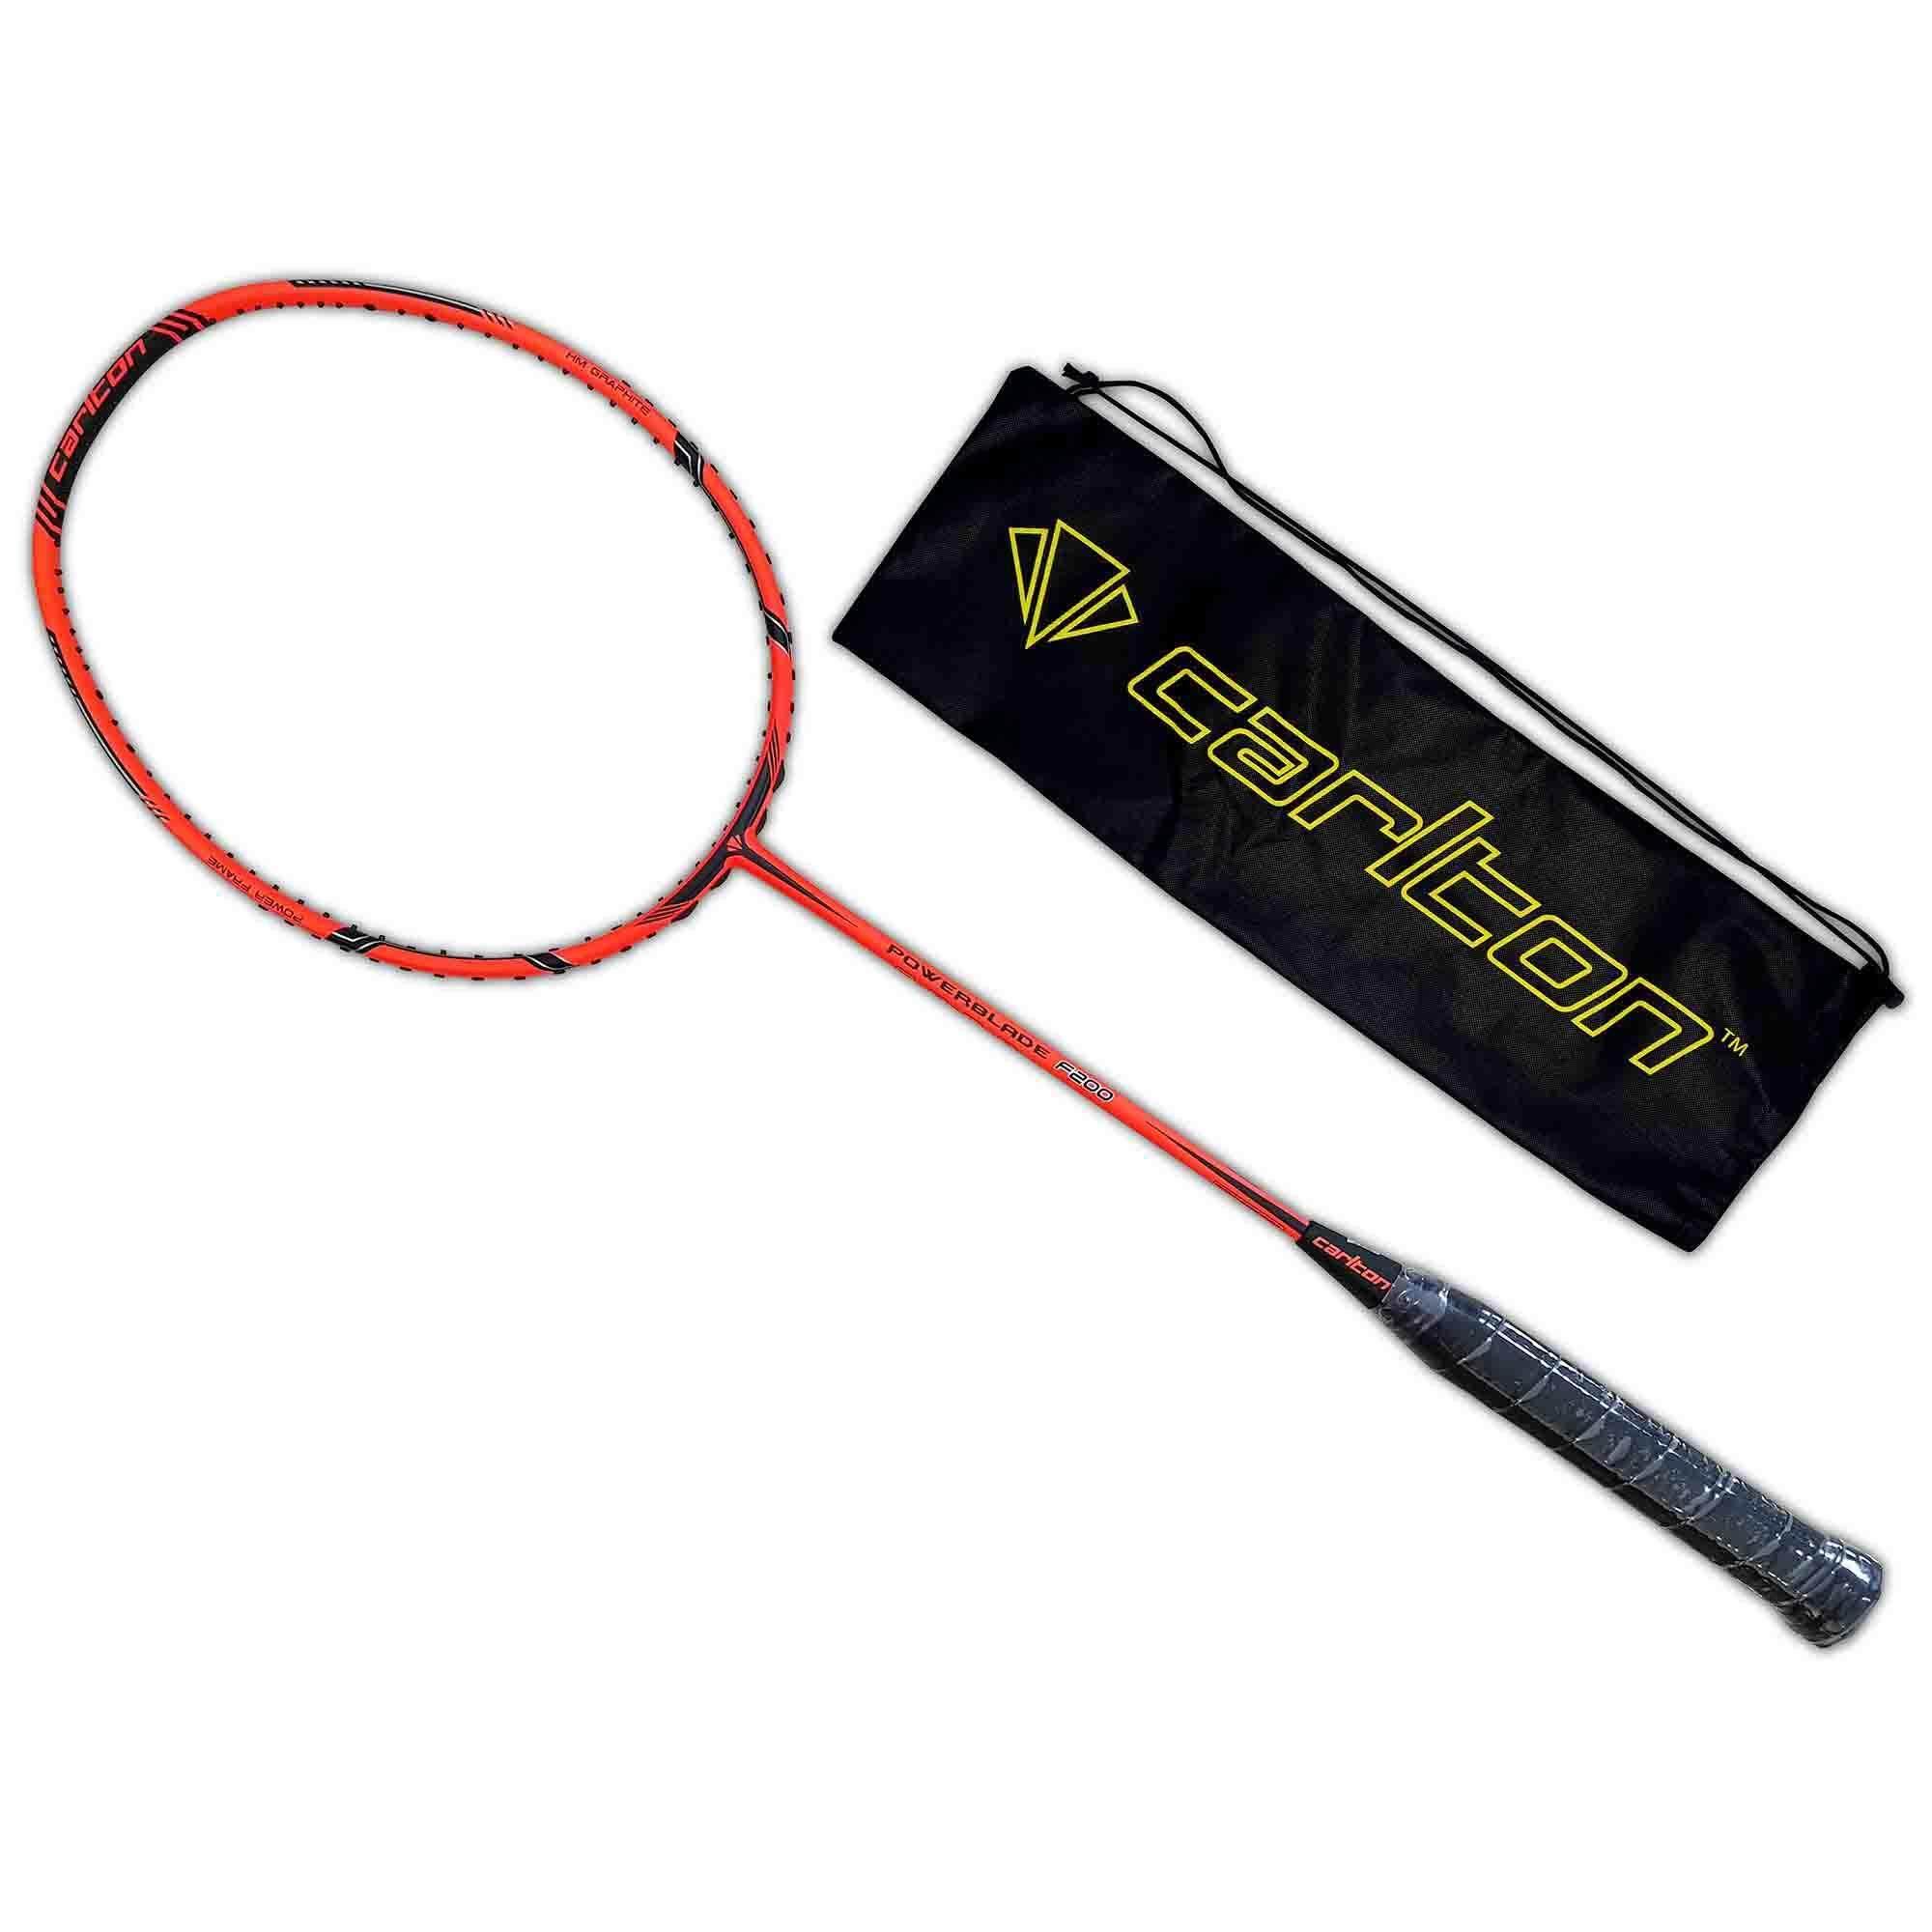 Carlton Badminton Racket Powerblade F 200